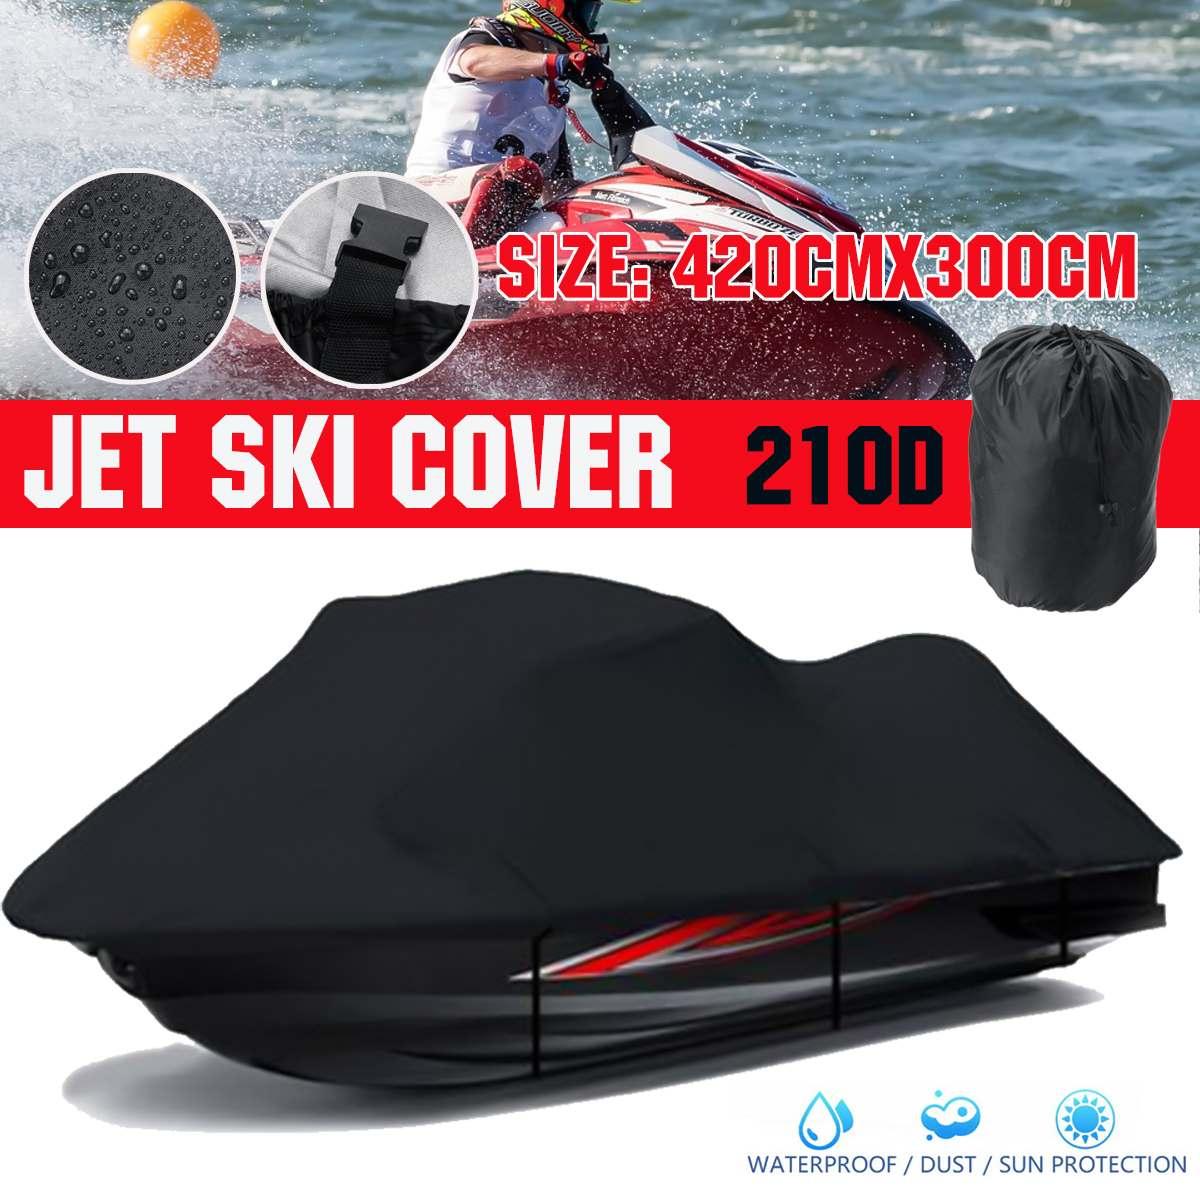 420x300cm Jet Ski Boat Cover 210D Waterproof Sunshade Anti Snow Watercraft Motorboat Cover For Yamaha WaveRunner EXR/VX Cruiser